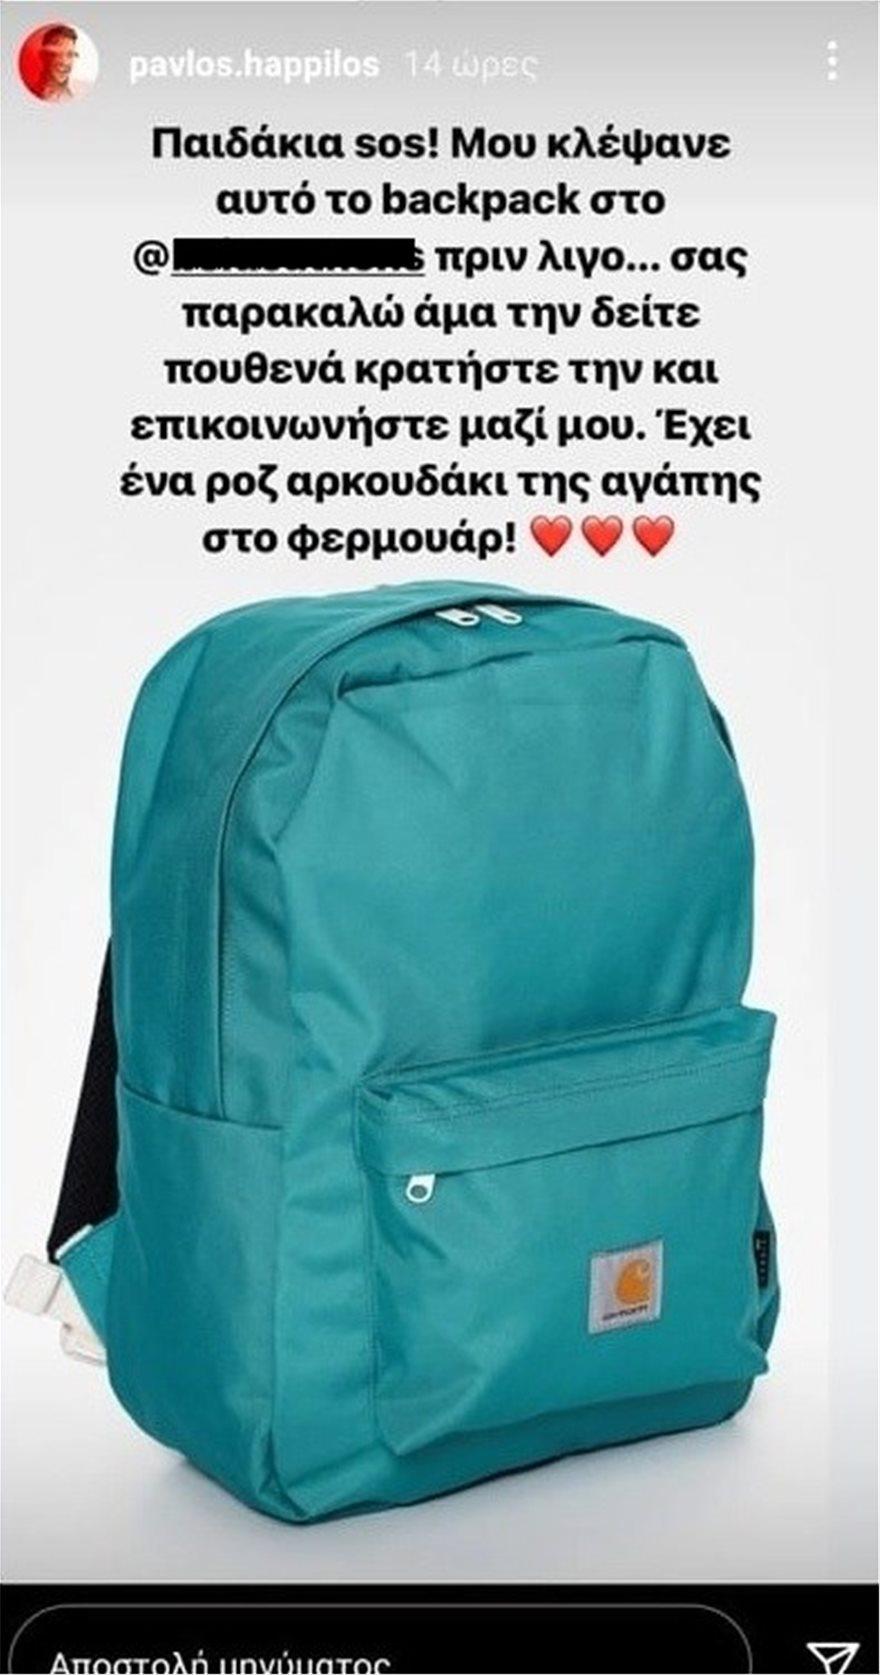 pavlos_1_2